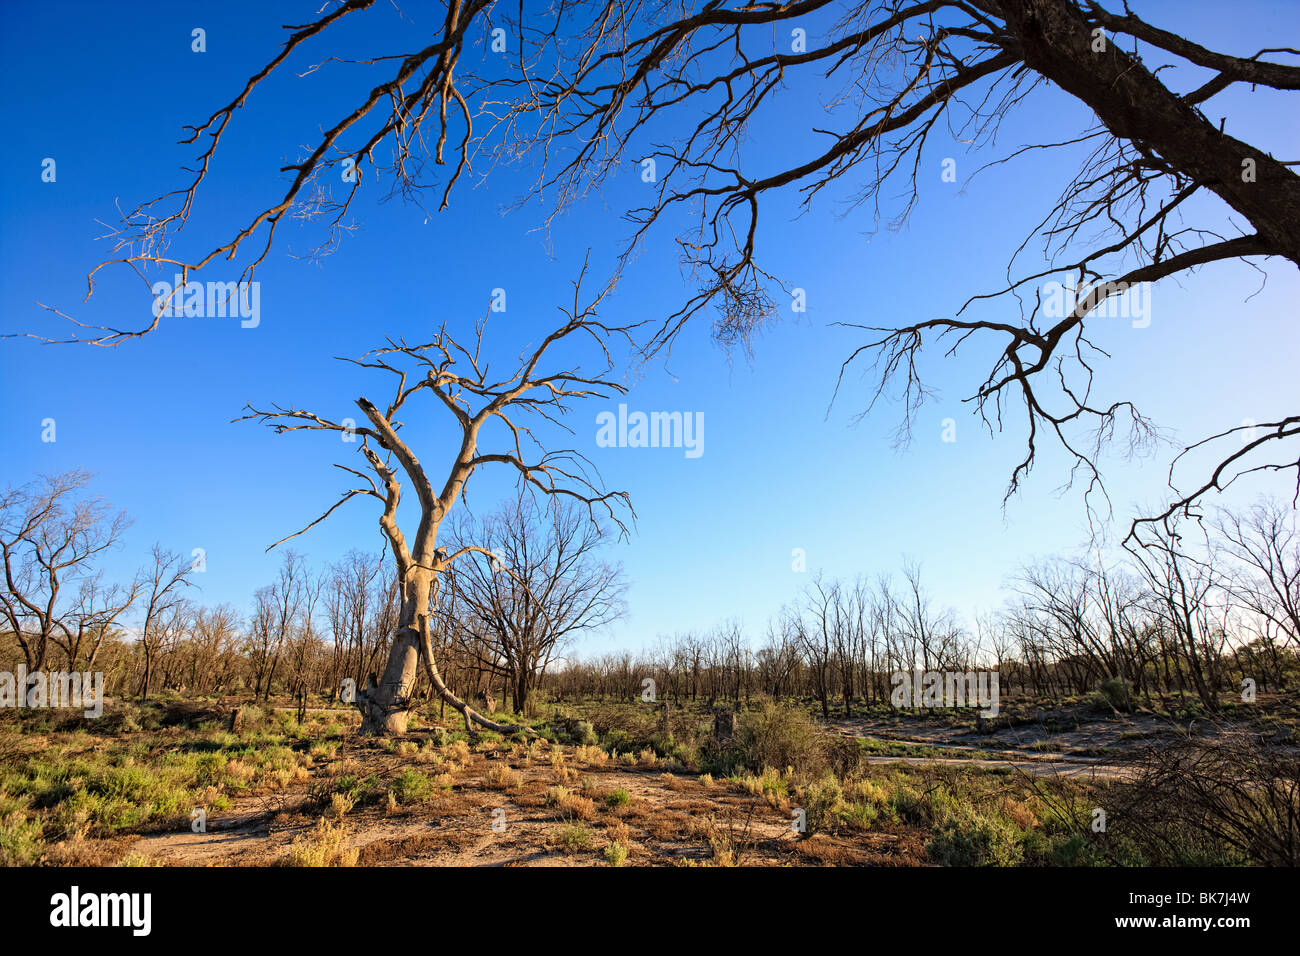 Dead tree, Murray ?Darling Basin, South Eastern Australia. - Stock Image